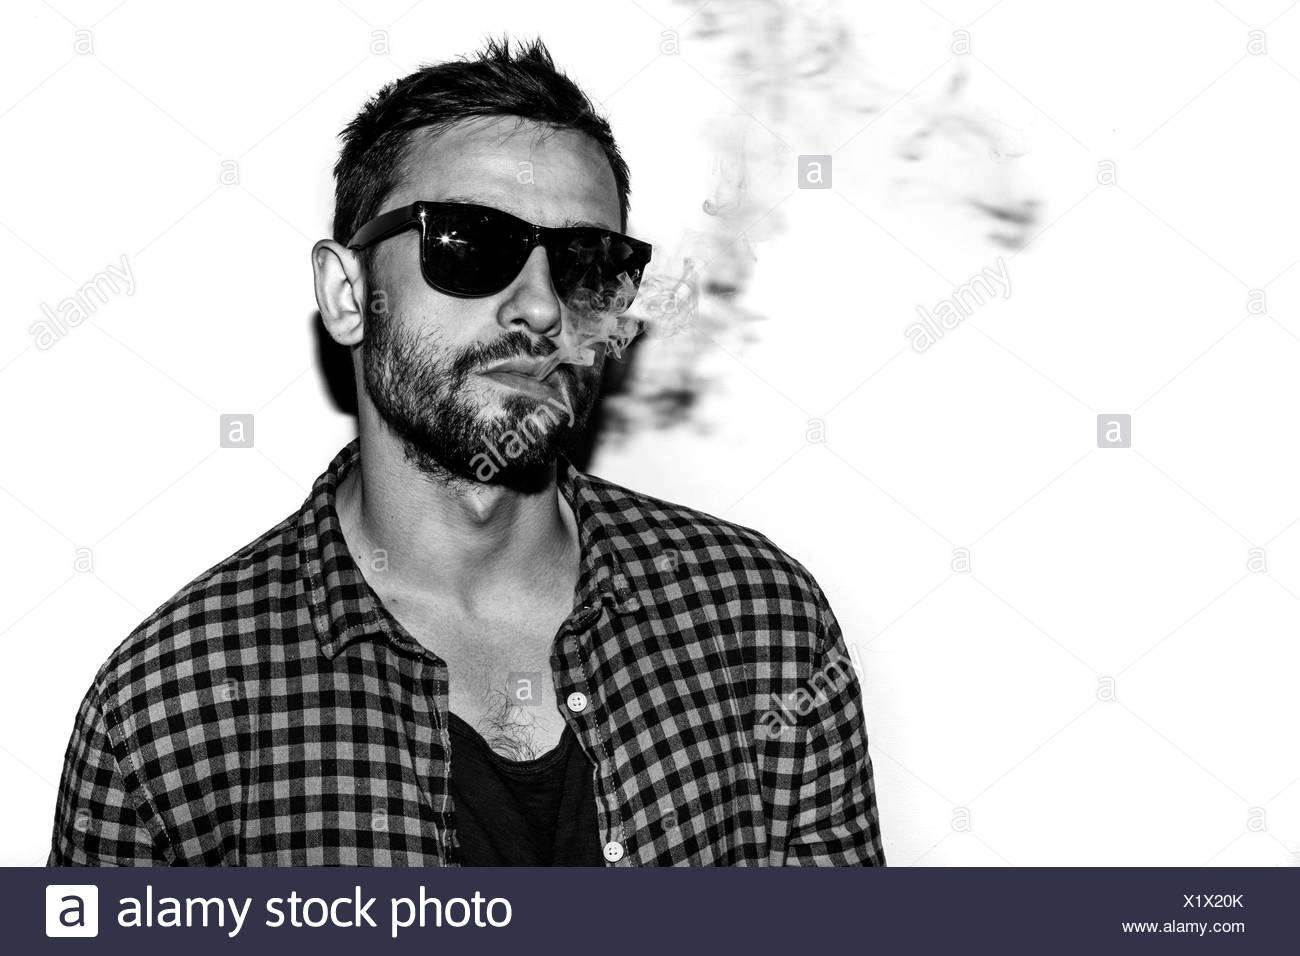 man smoking cigarette black and white portrait - Stock Image